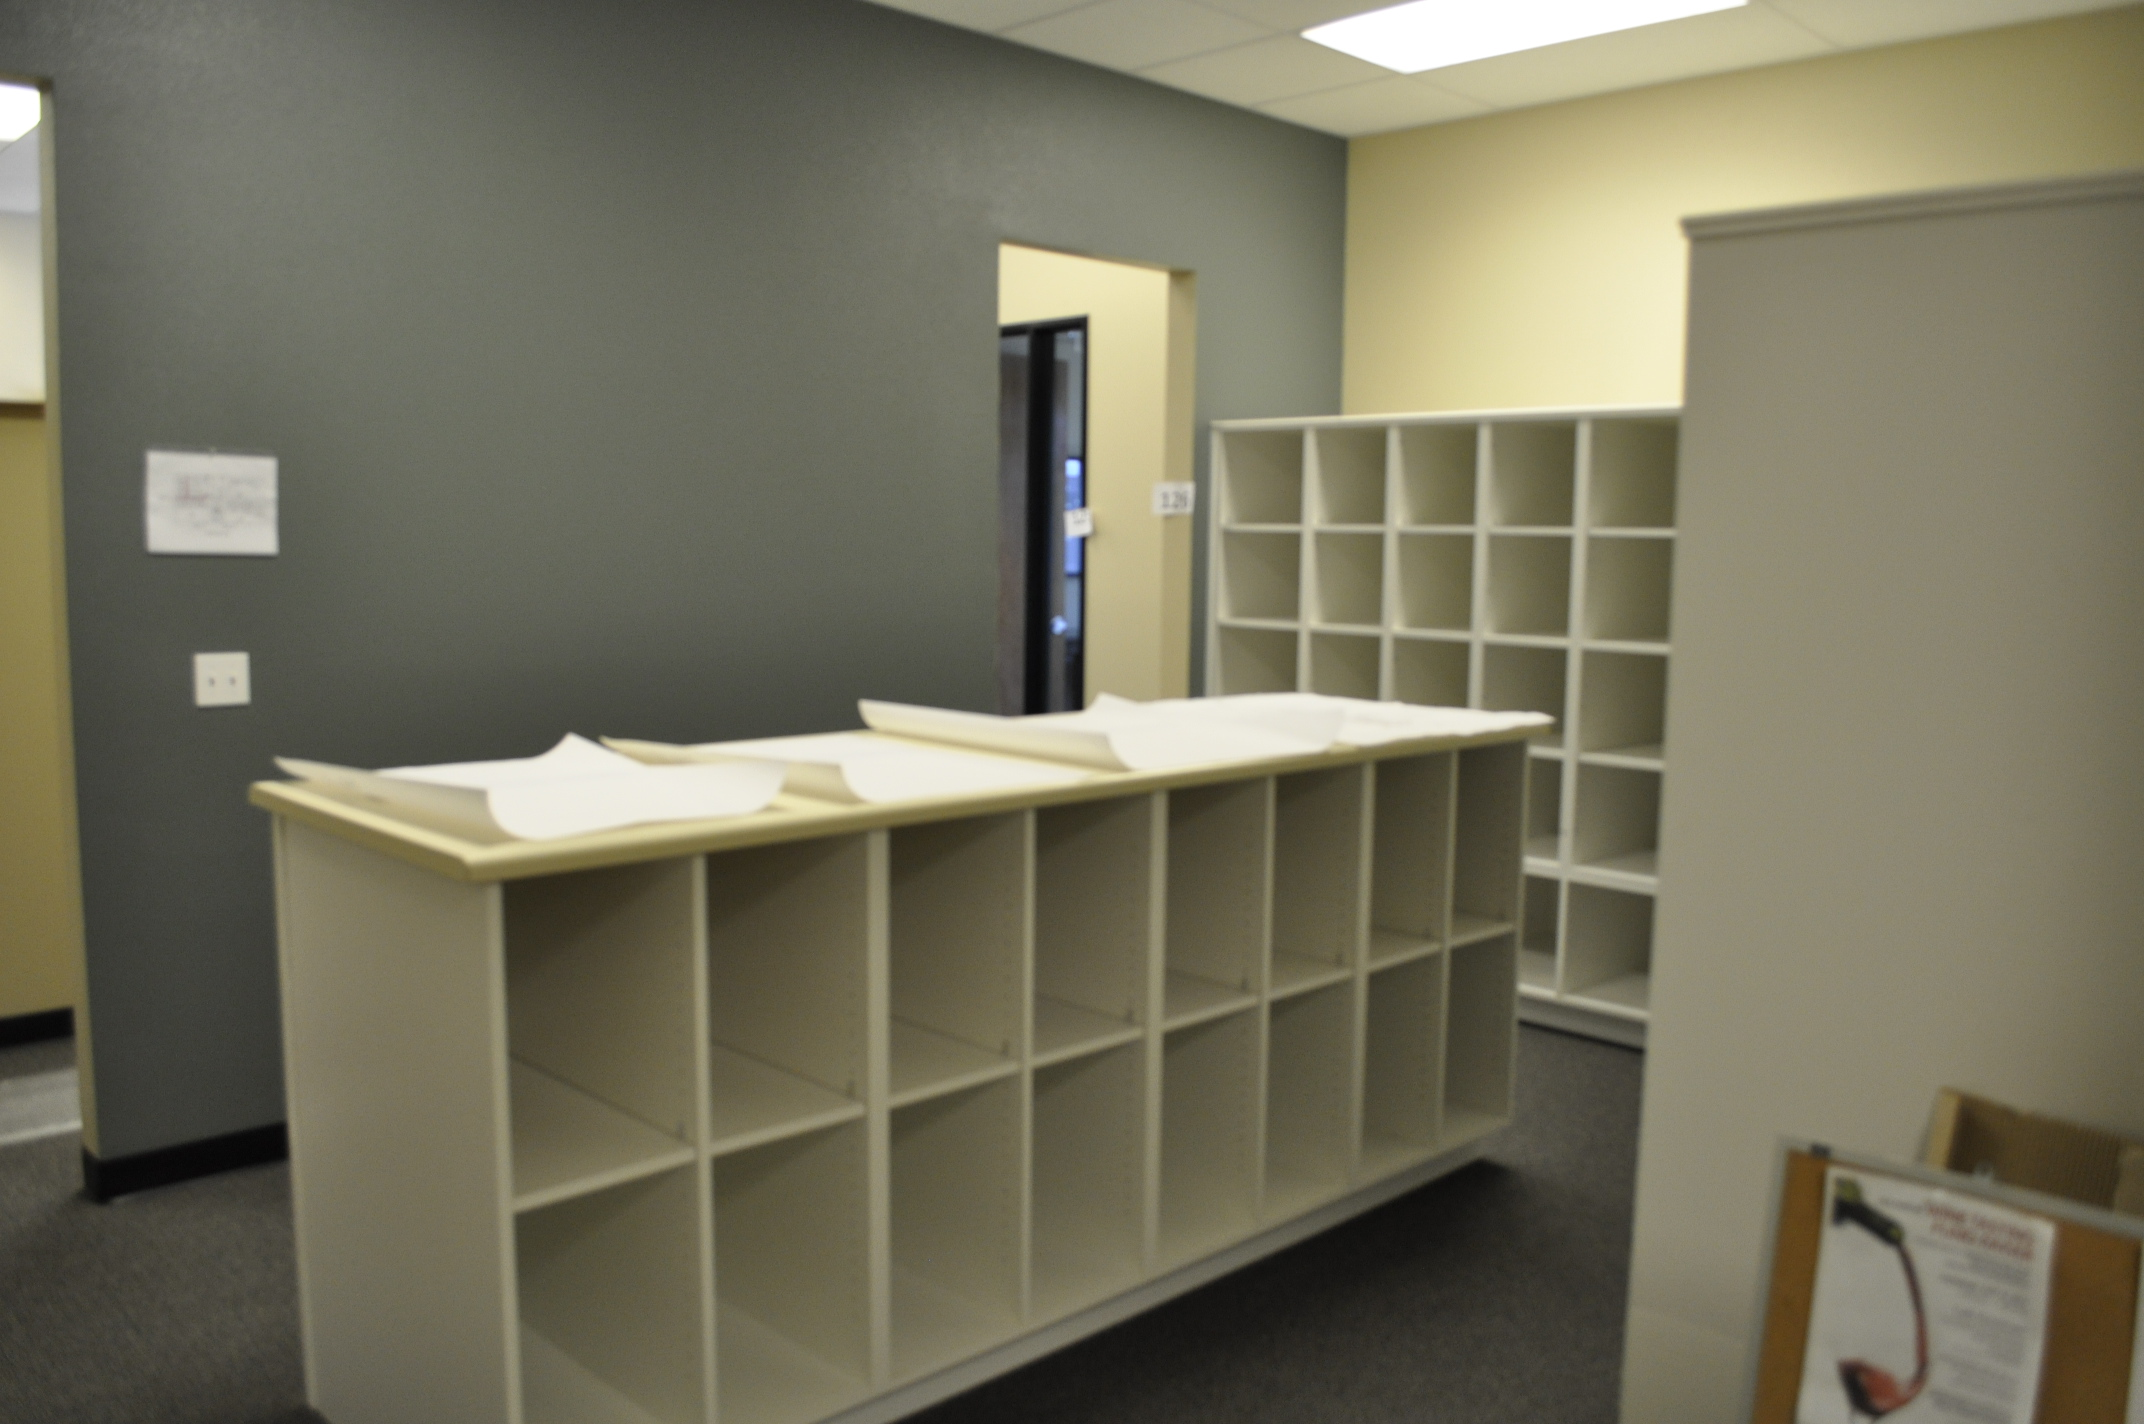 Plan Storage Room